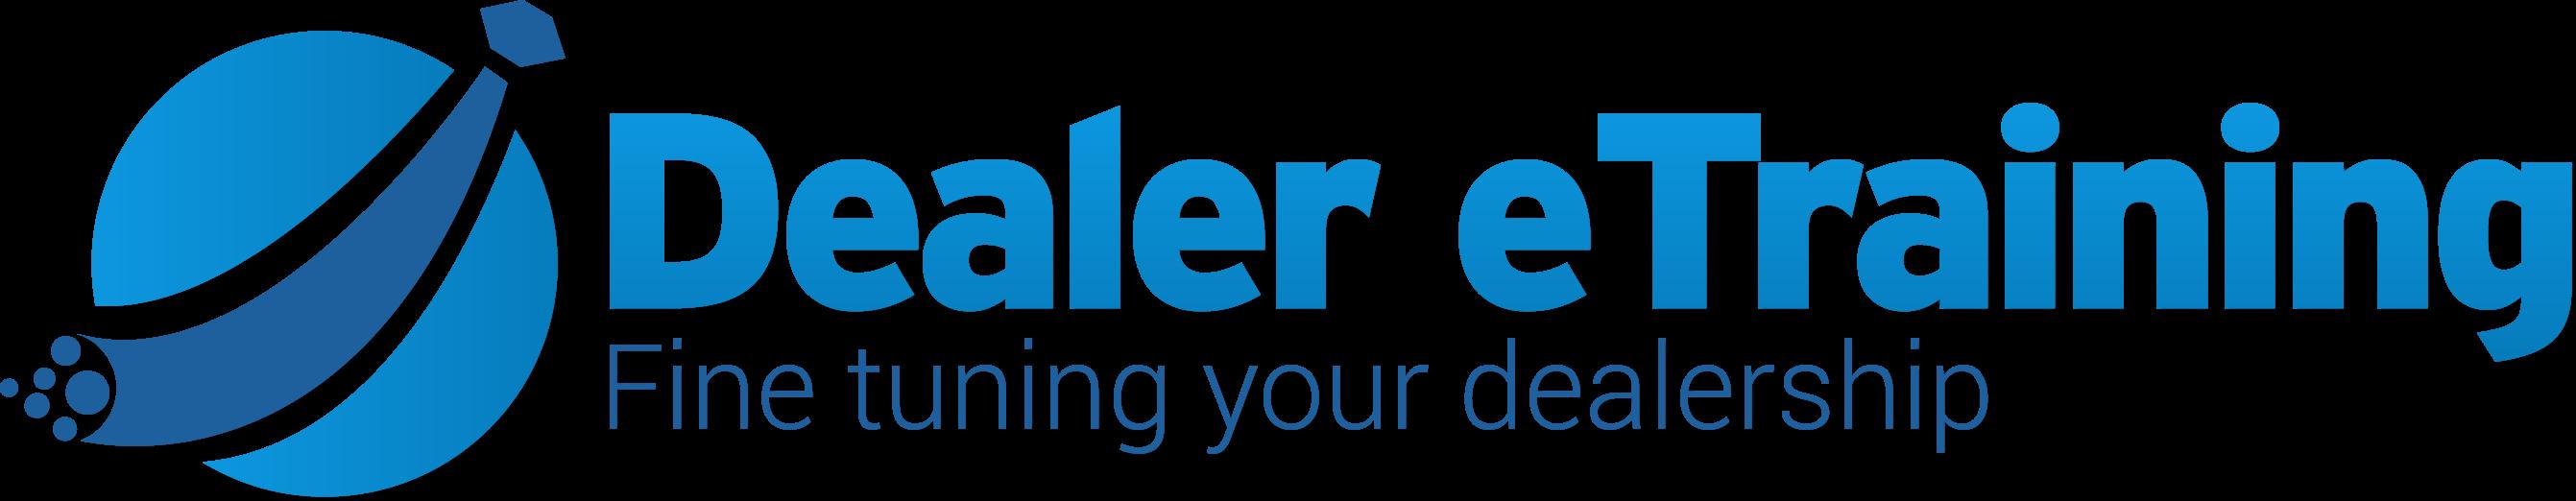 Dealer eTraining